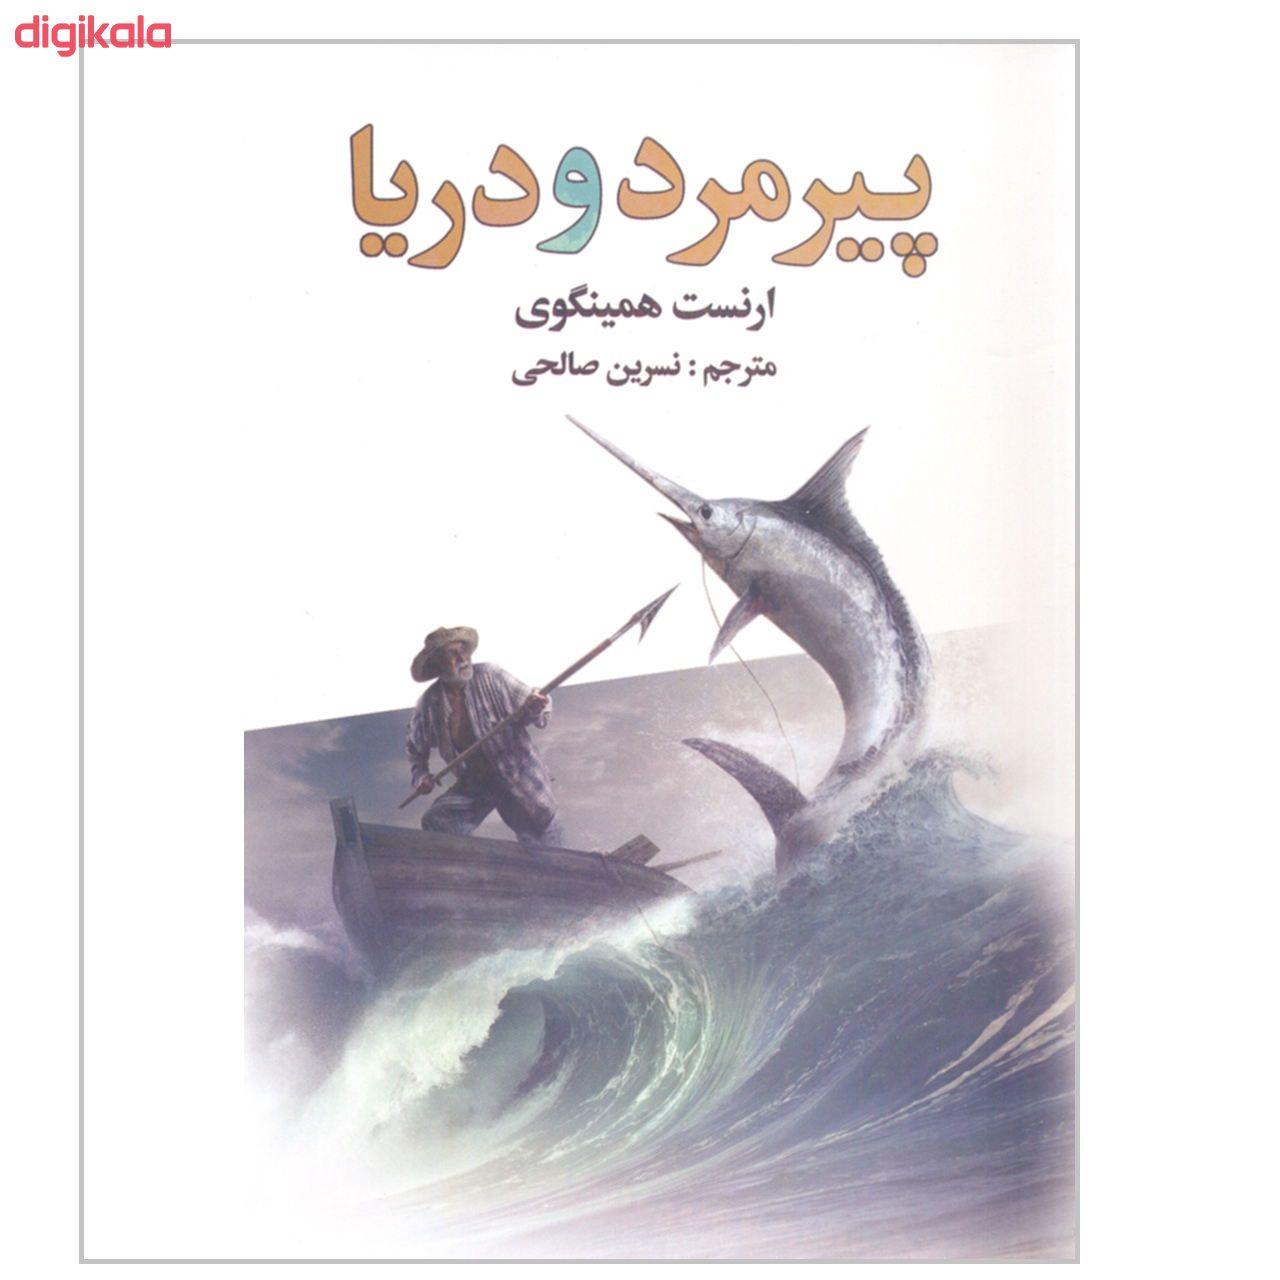 کتاب پیرمرد و دریا اثر ارنست همینگوی انتشاراتسالار الموتی main 1 1